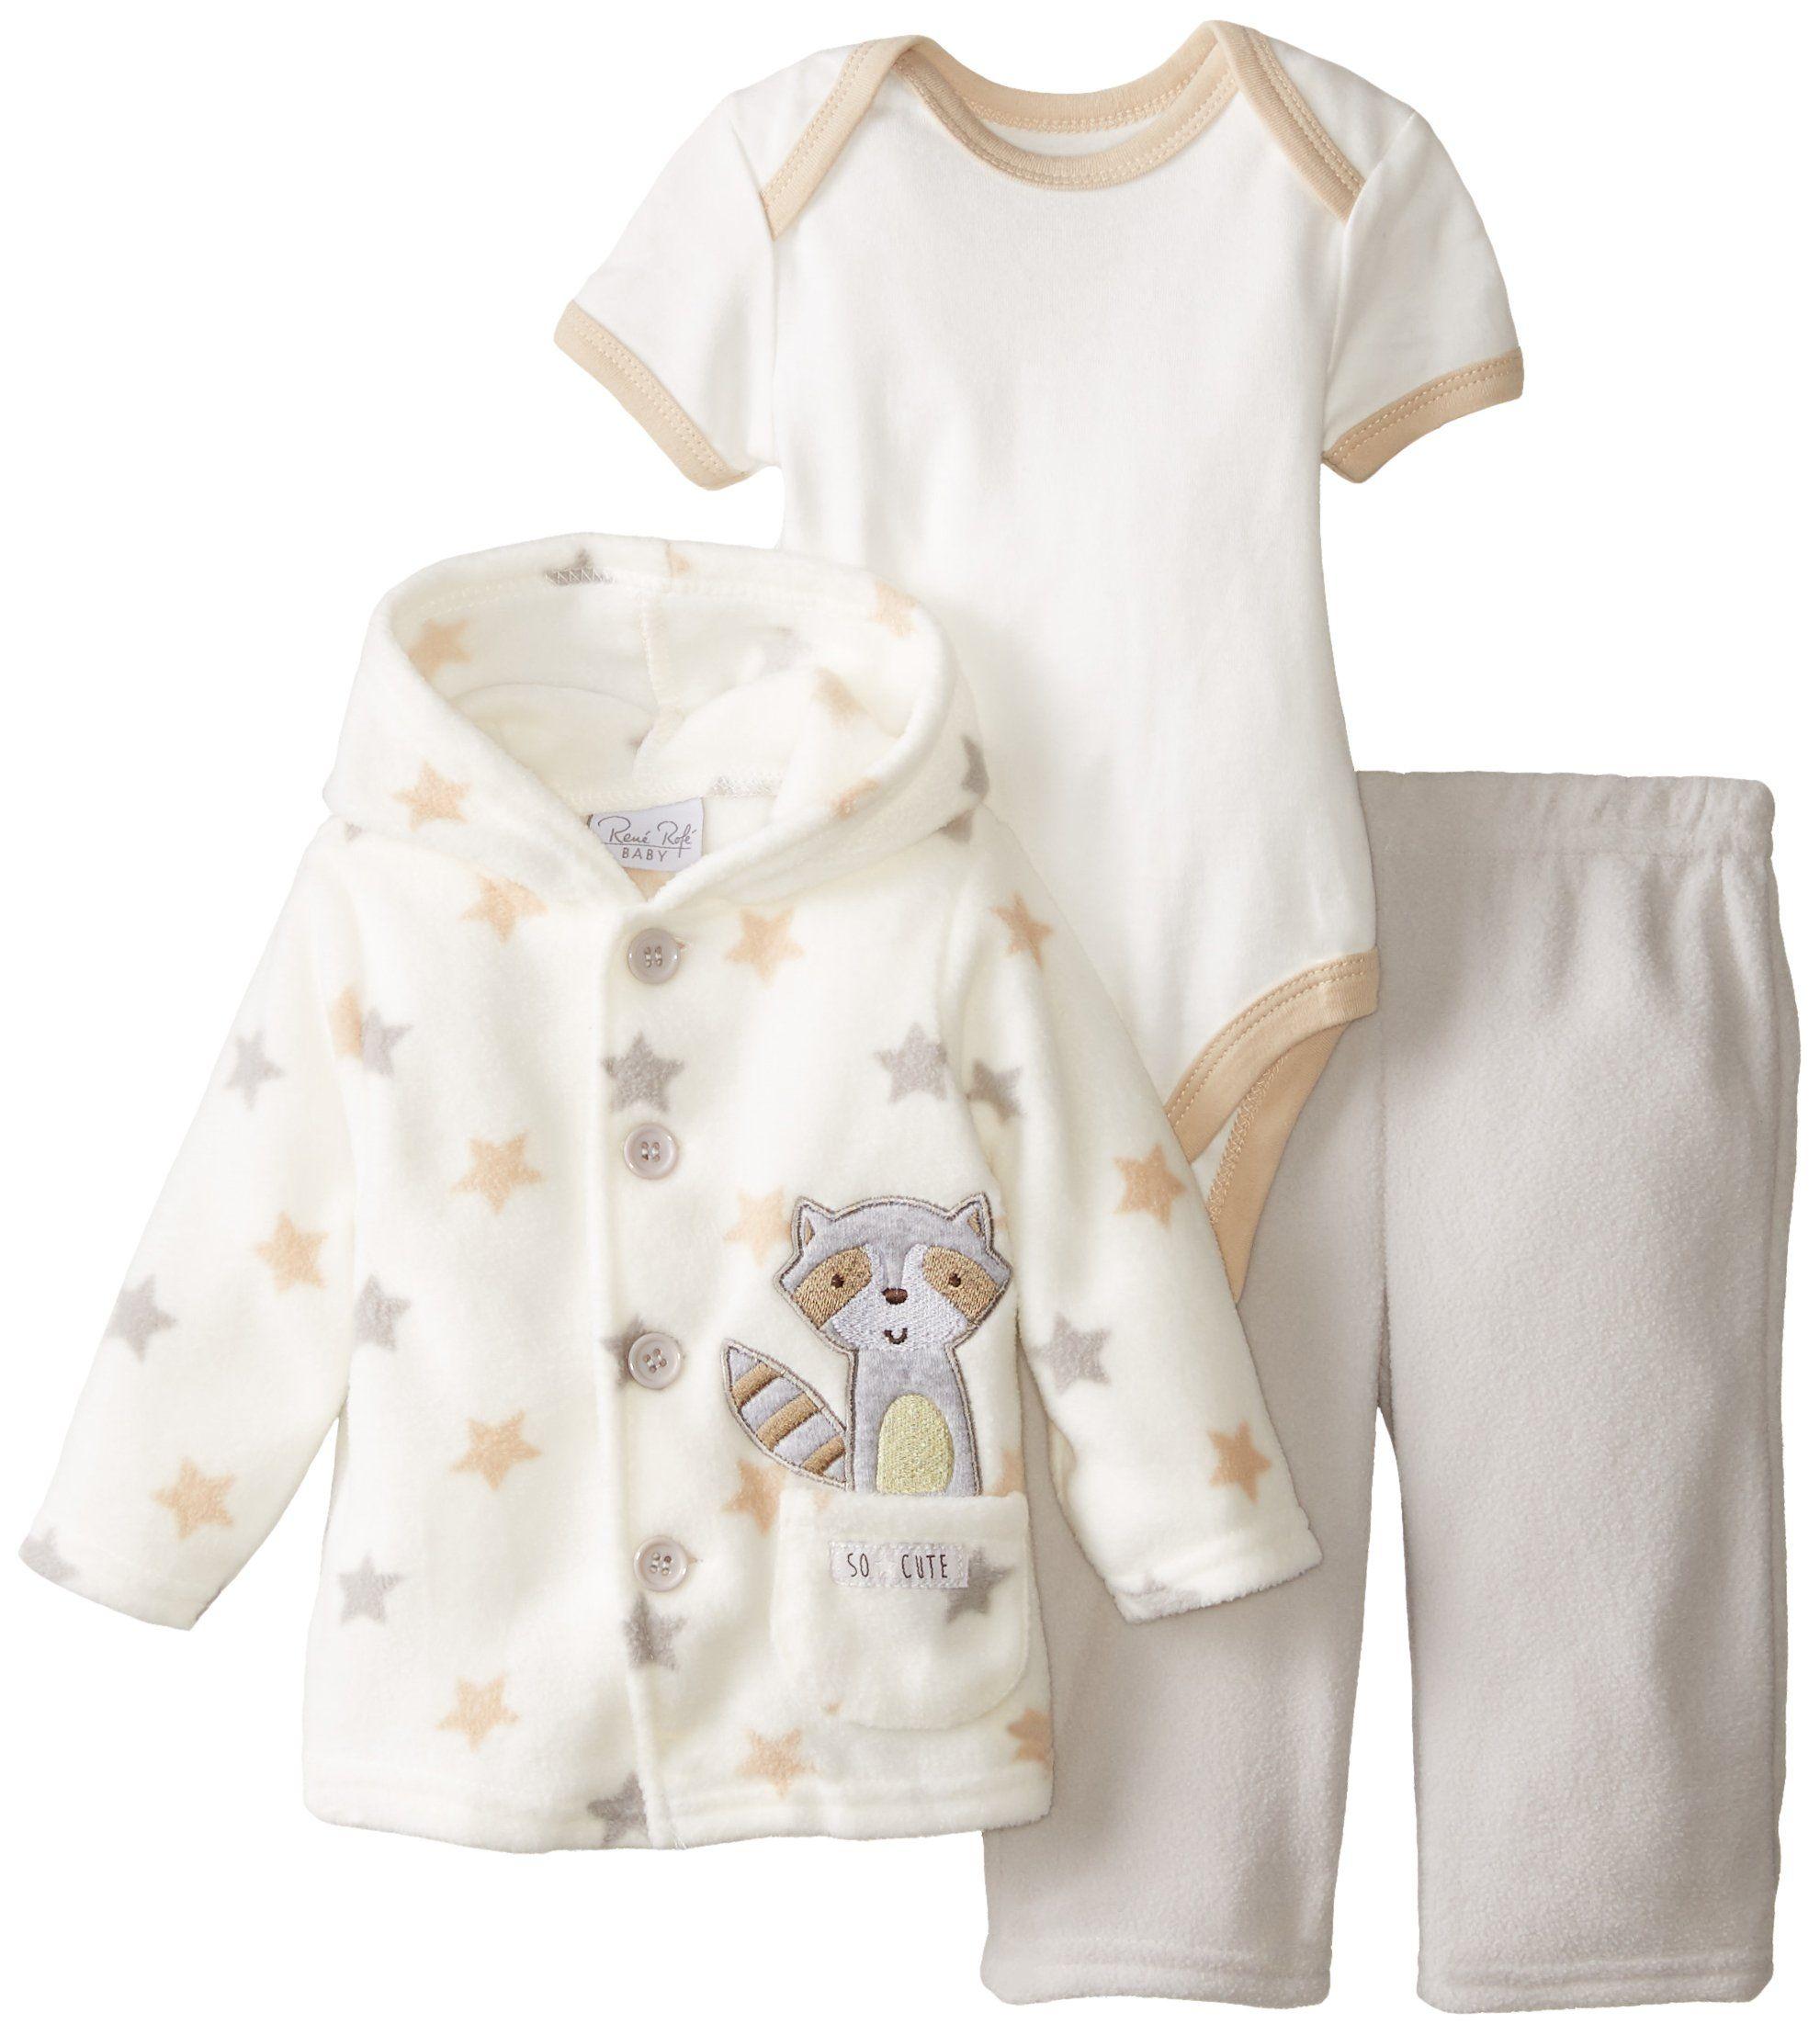 c7418abf3 Rene Rofe Baby Unisex-Baby Newborn 3 Piece Micro Fleece Button Front ...